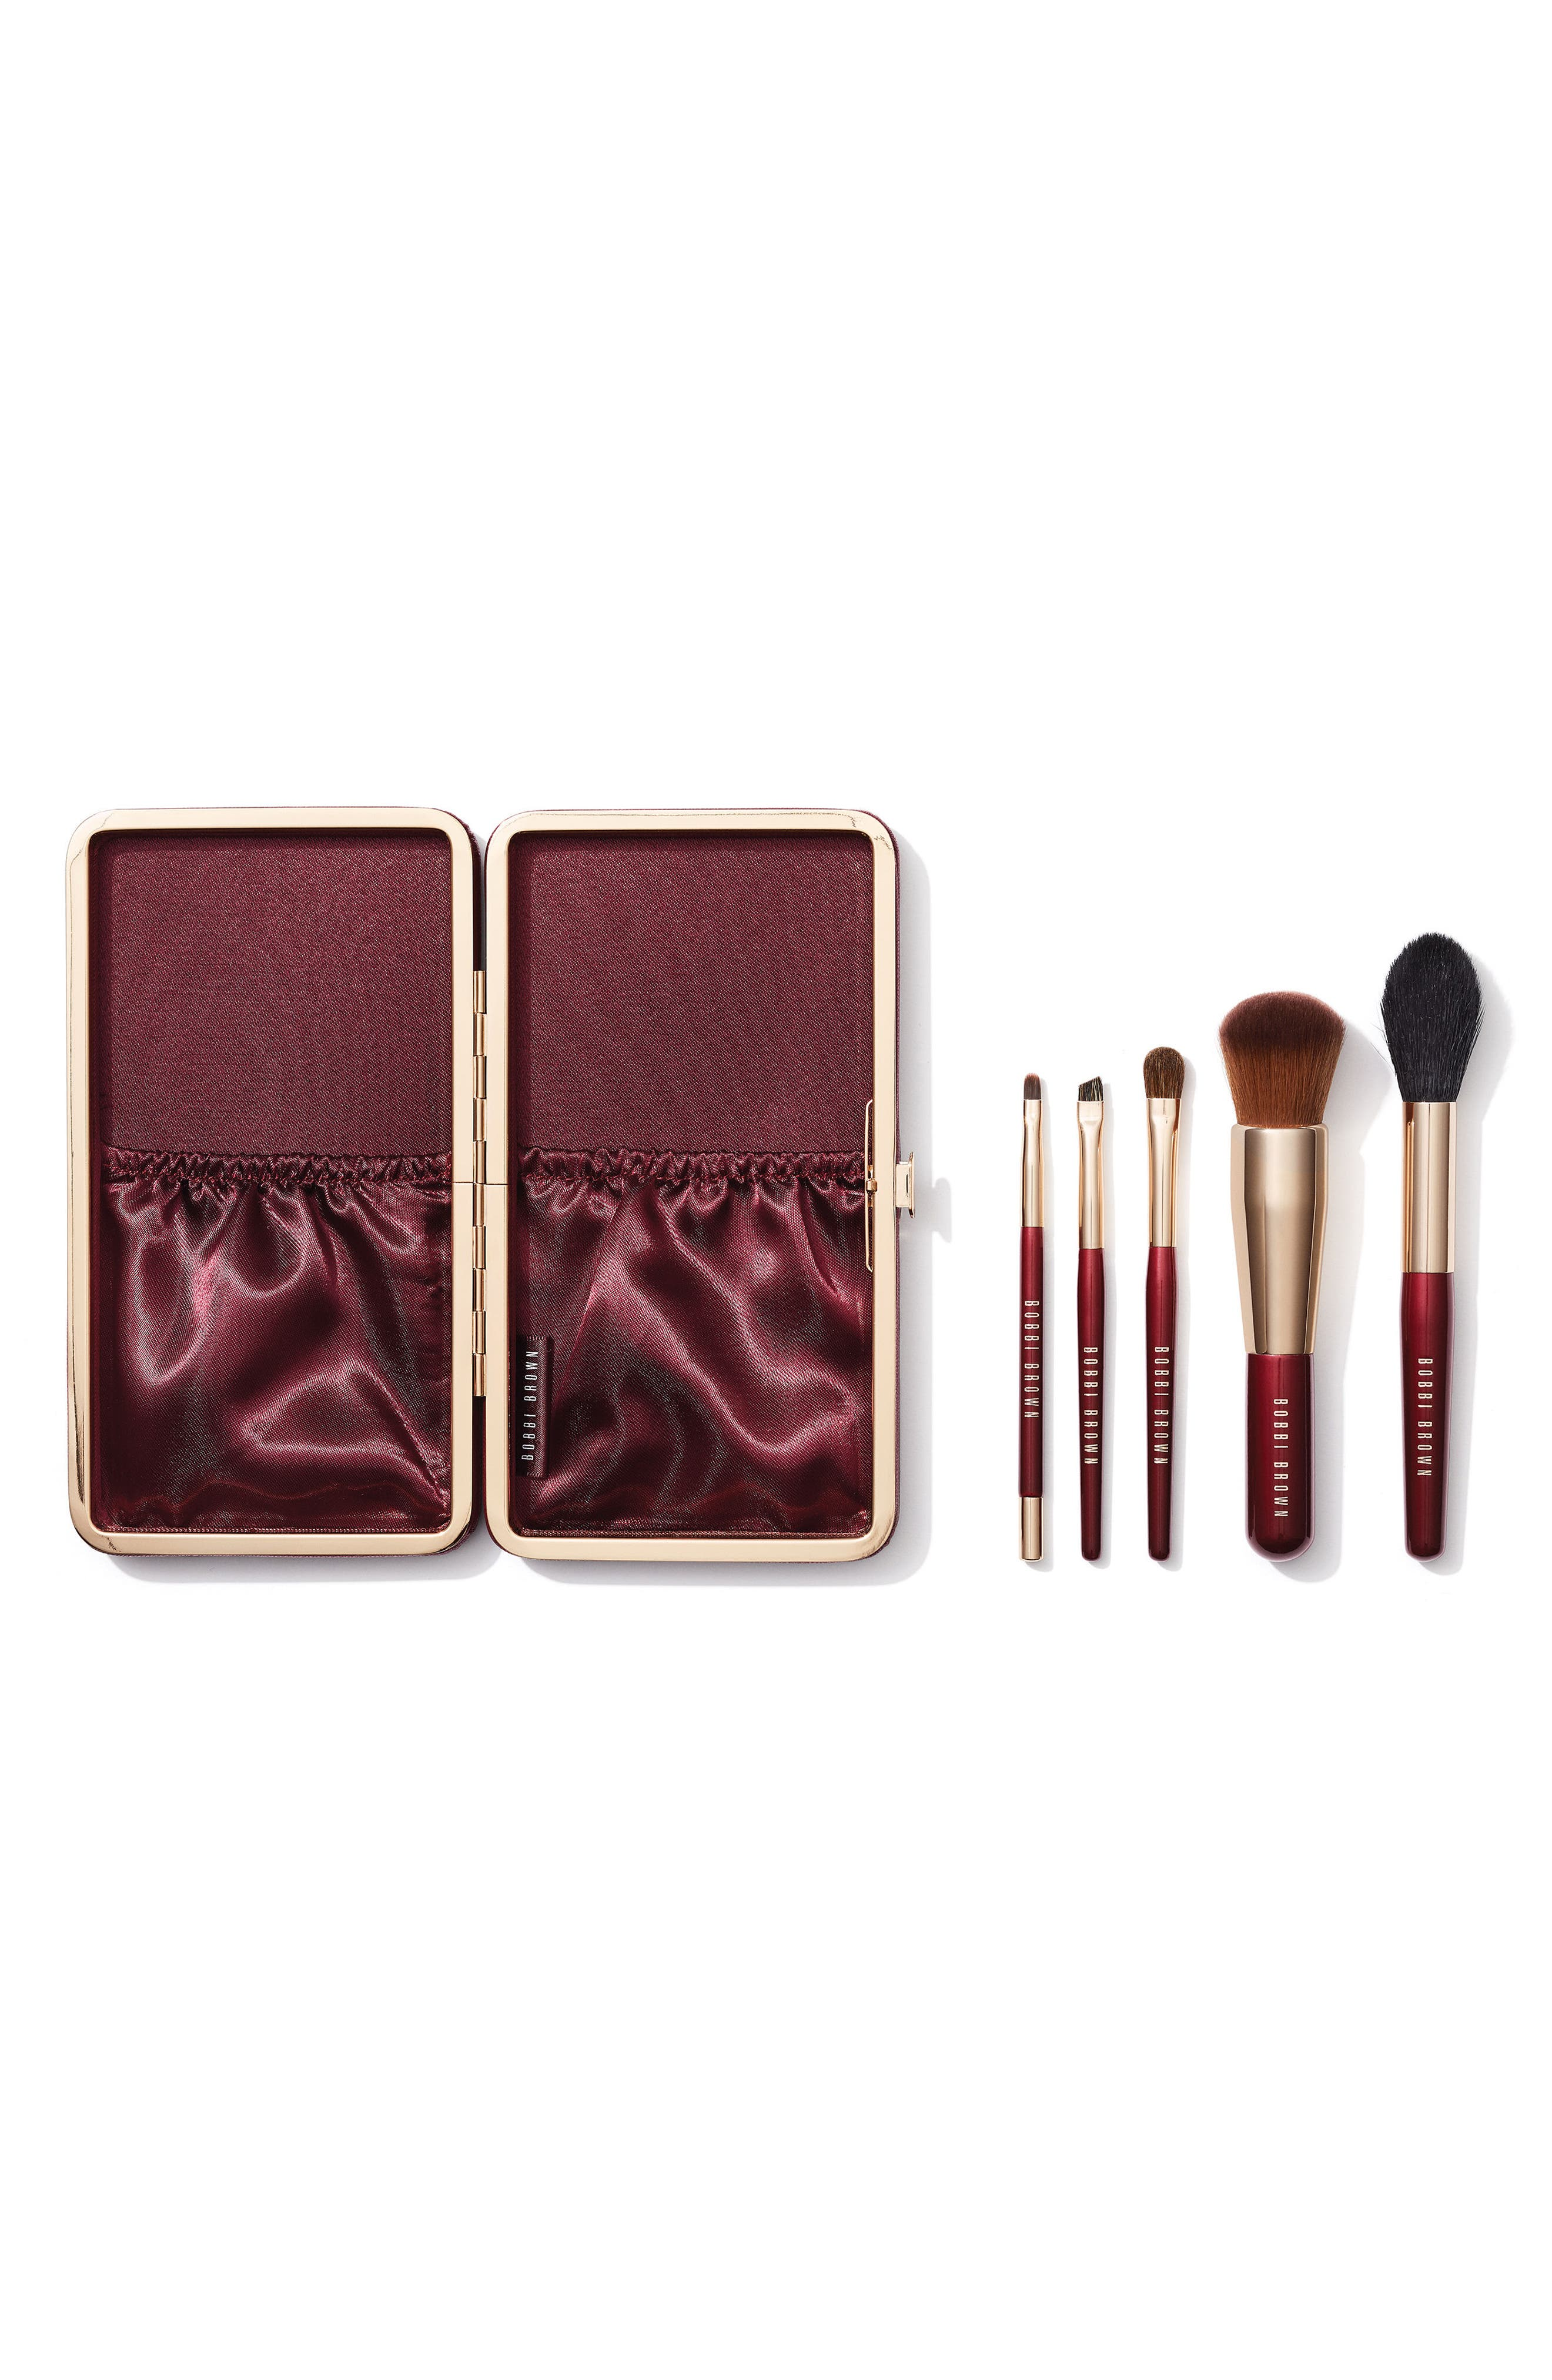 Bobbi Brown Travel Brush Set ($228 Value)